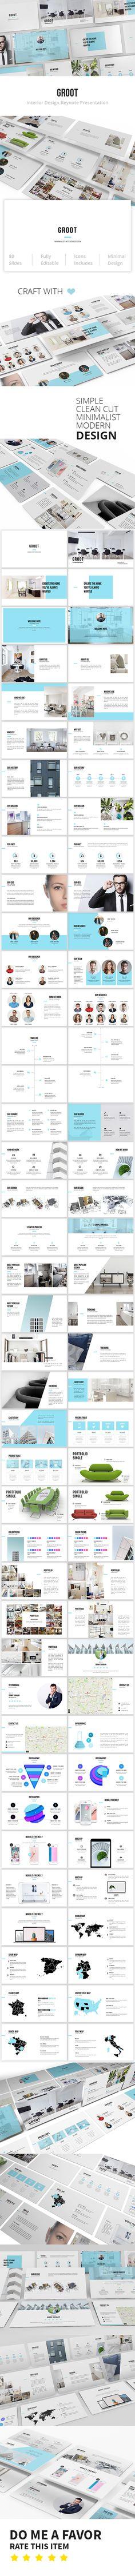 Groot - Interior Design Keynote Template